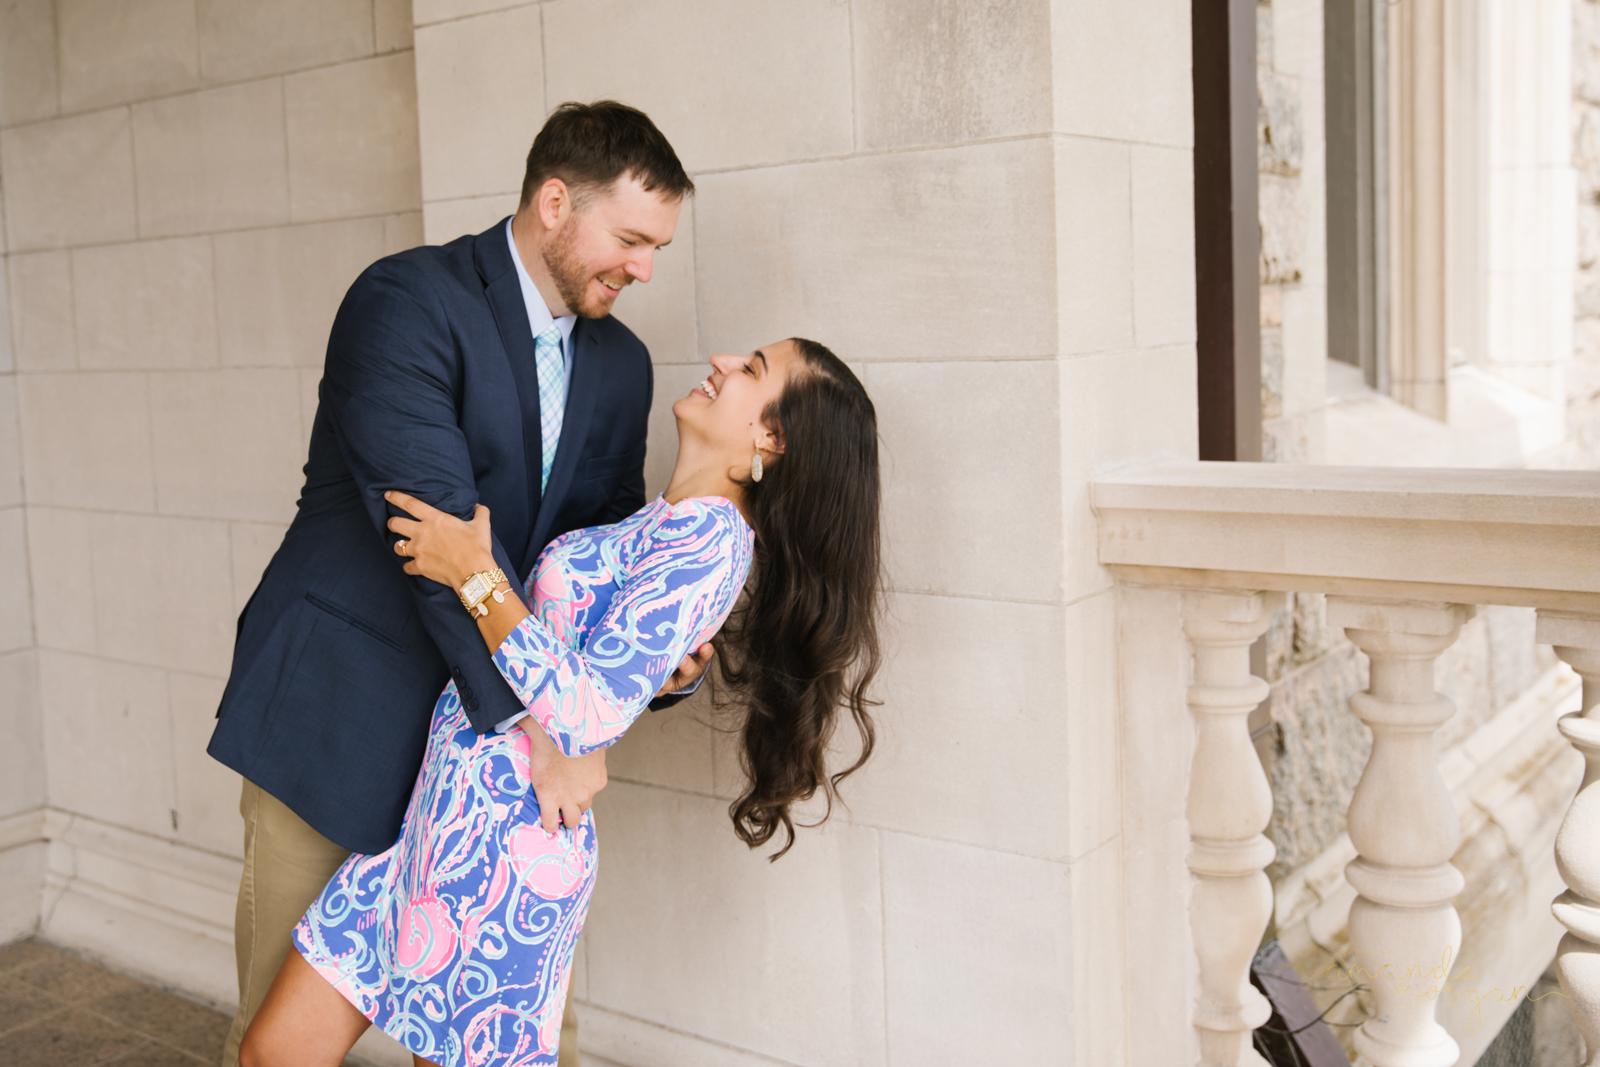 Surprise-Engagement-photos-amanda-morgan-34.jpg